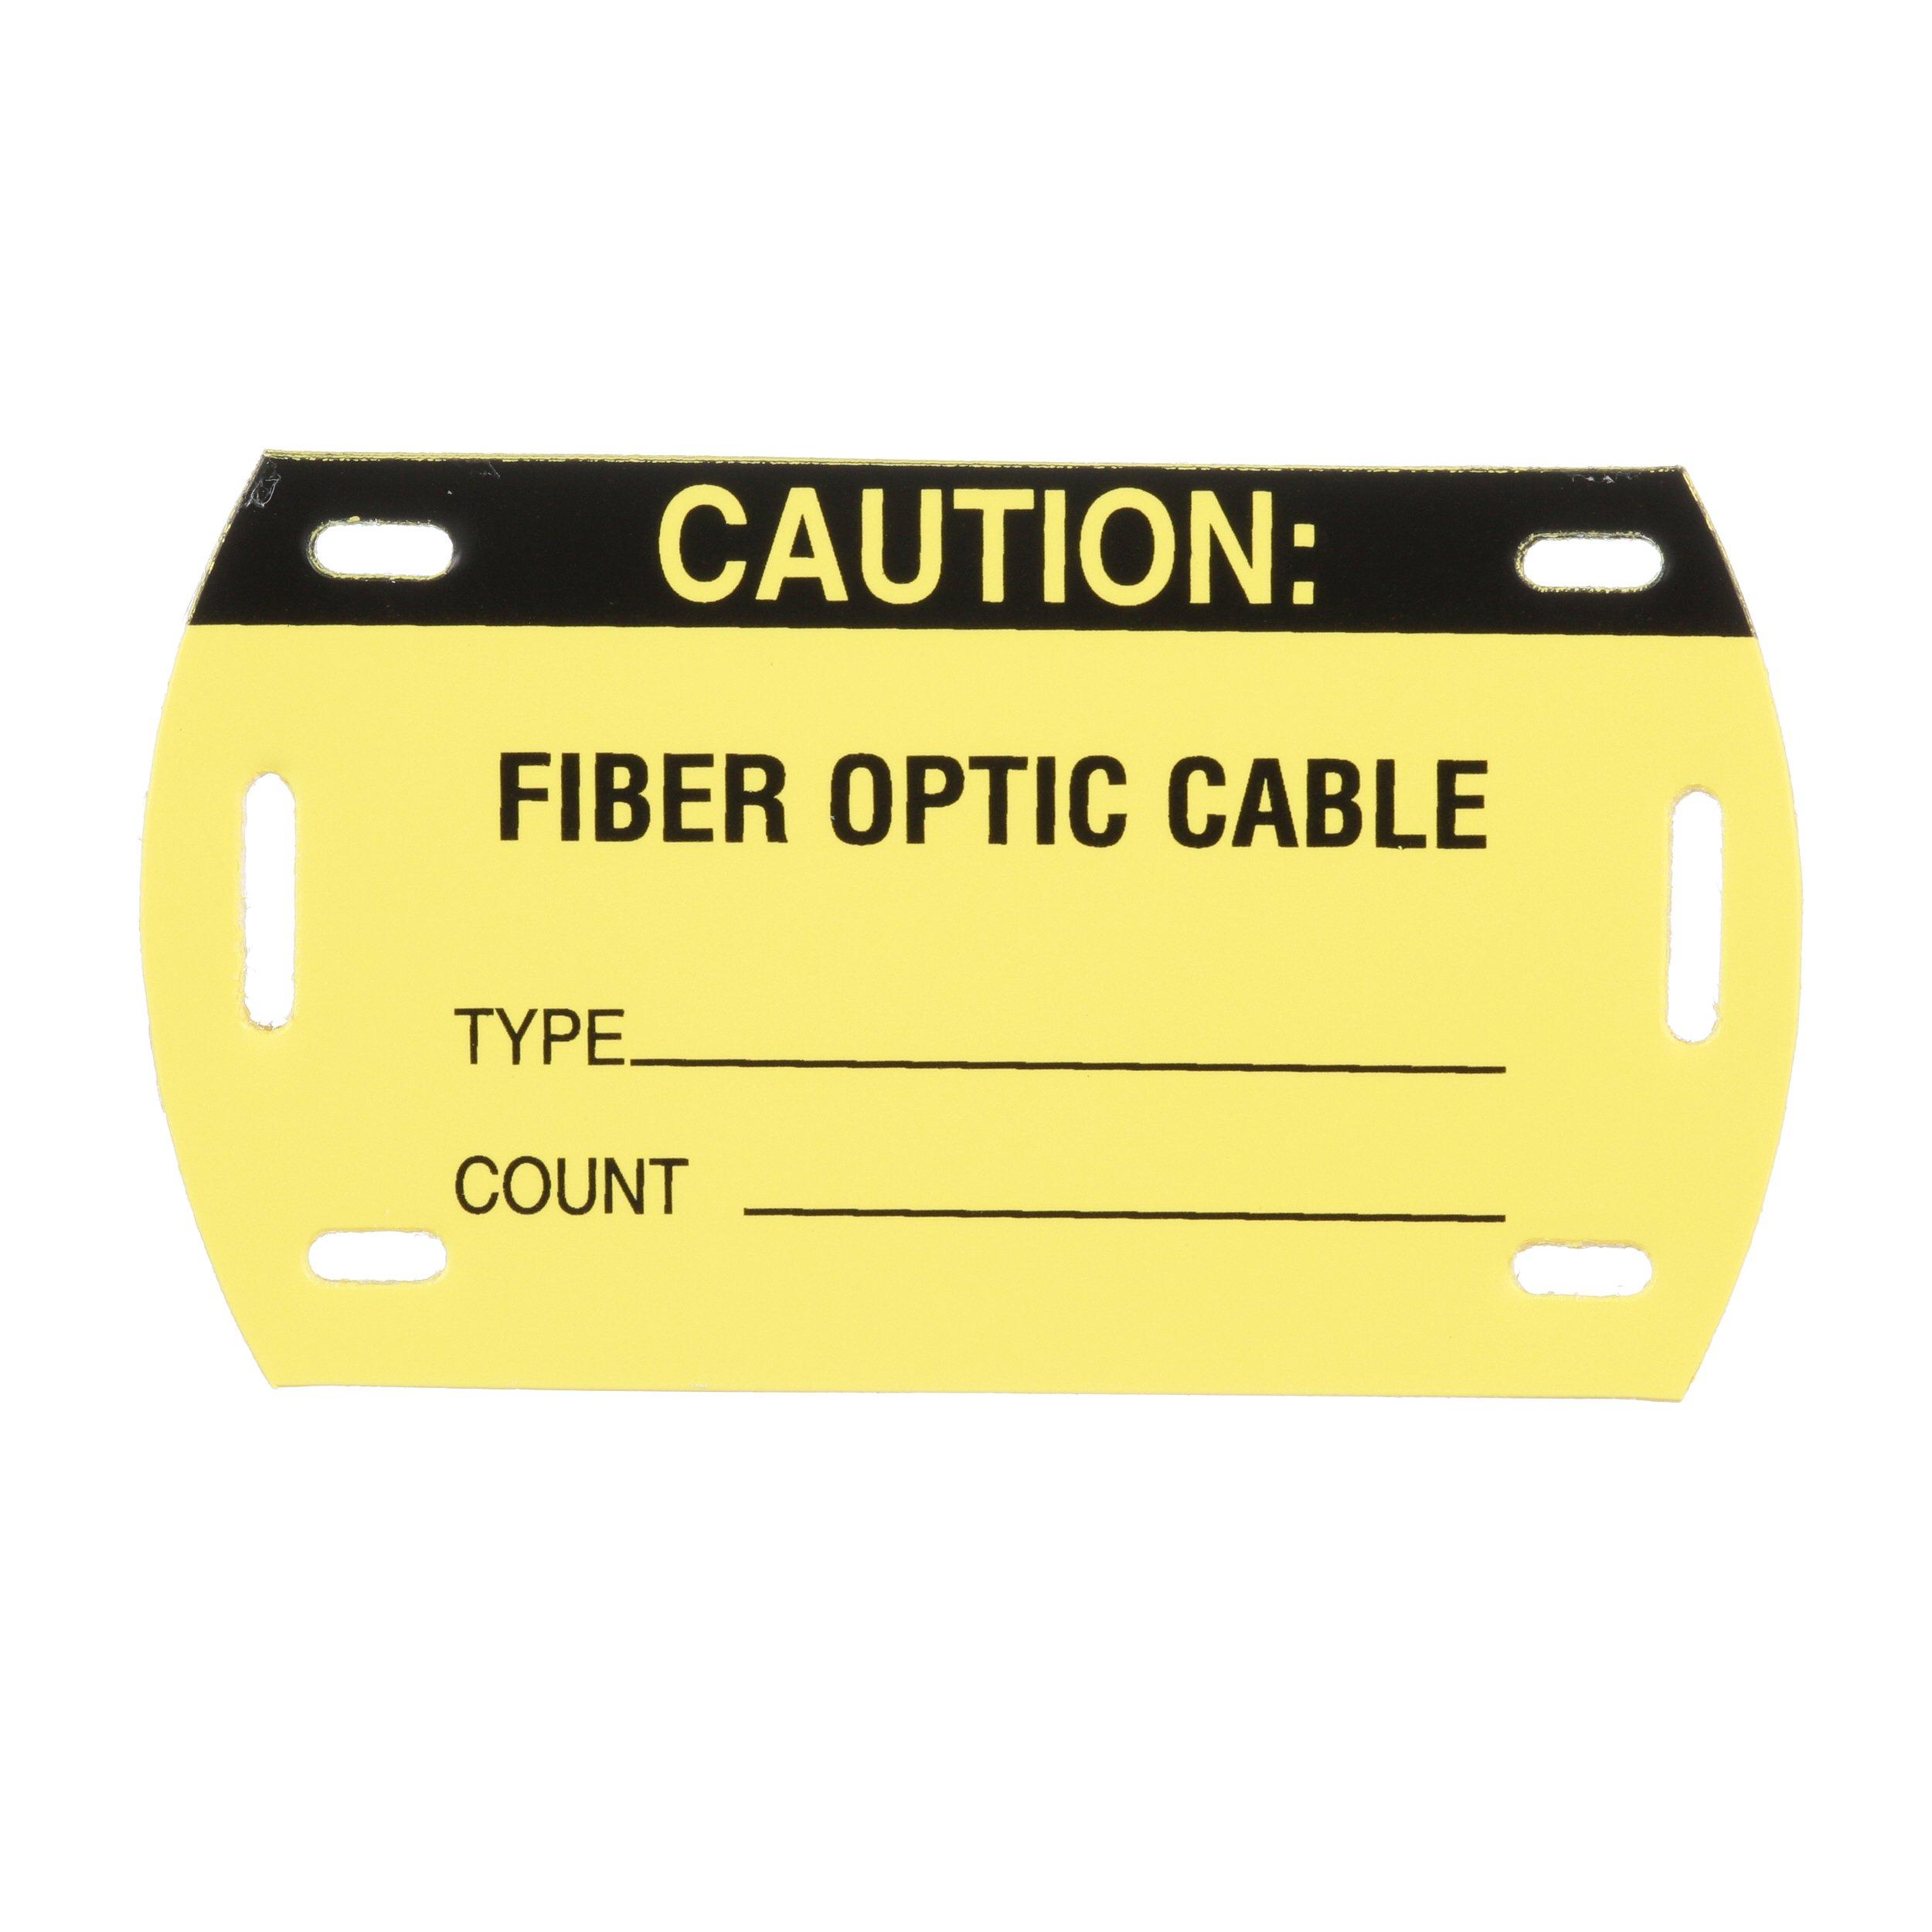 Panduit PST-FOBLNK Self-Laminating Fiber Optic Cable Blank Marker Tag, Yellow (5-Pack)